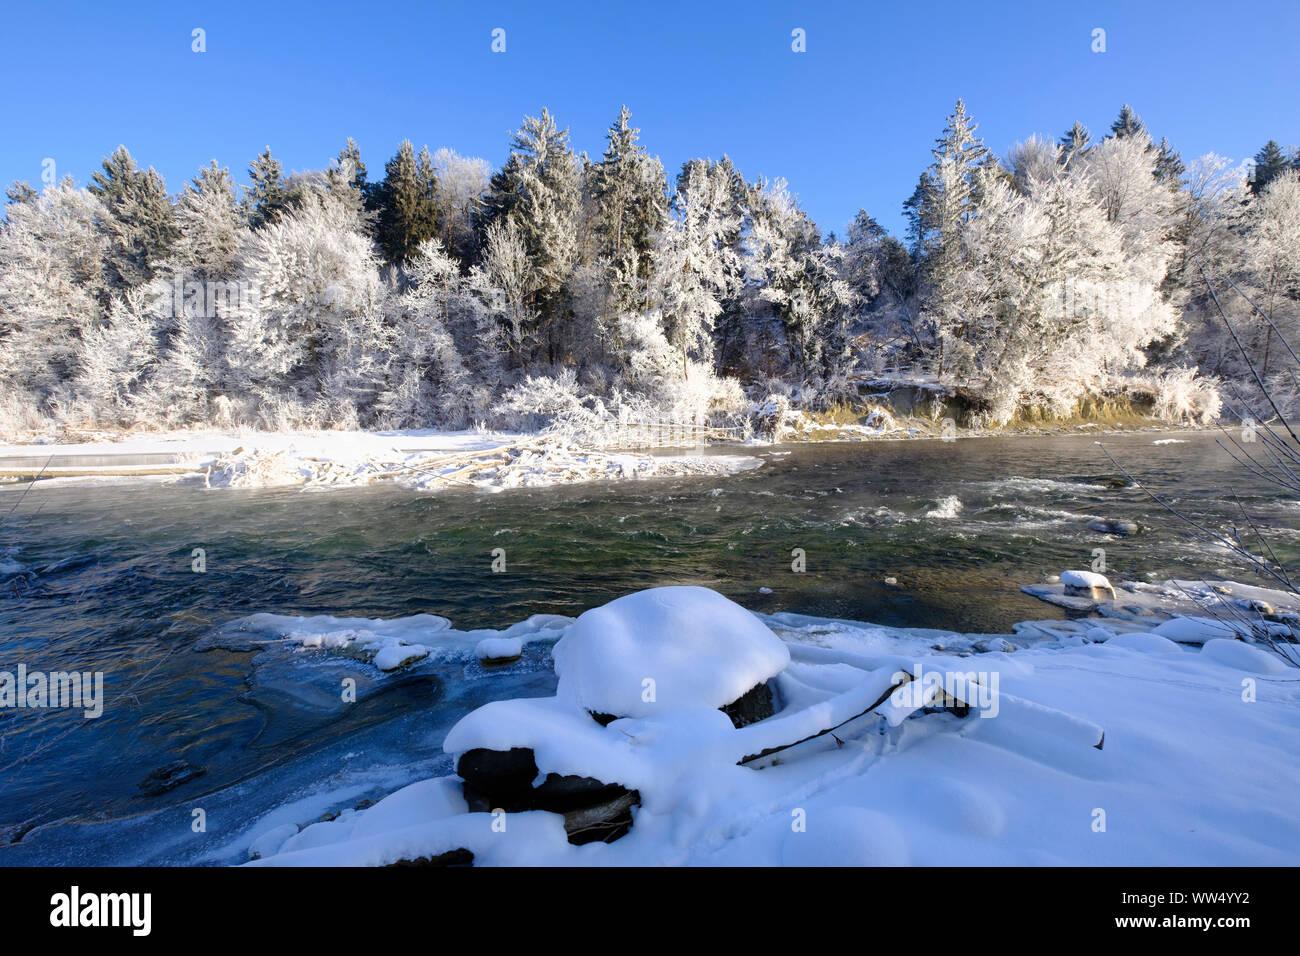 iced up riverside, hoarfrost in trees, Isar, nature reserve Isarauen, Geretsried, Upper Bavaria, Bavaria, Germany Stock Photo